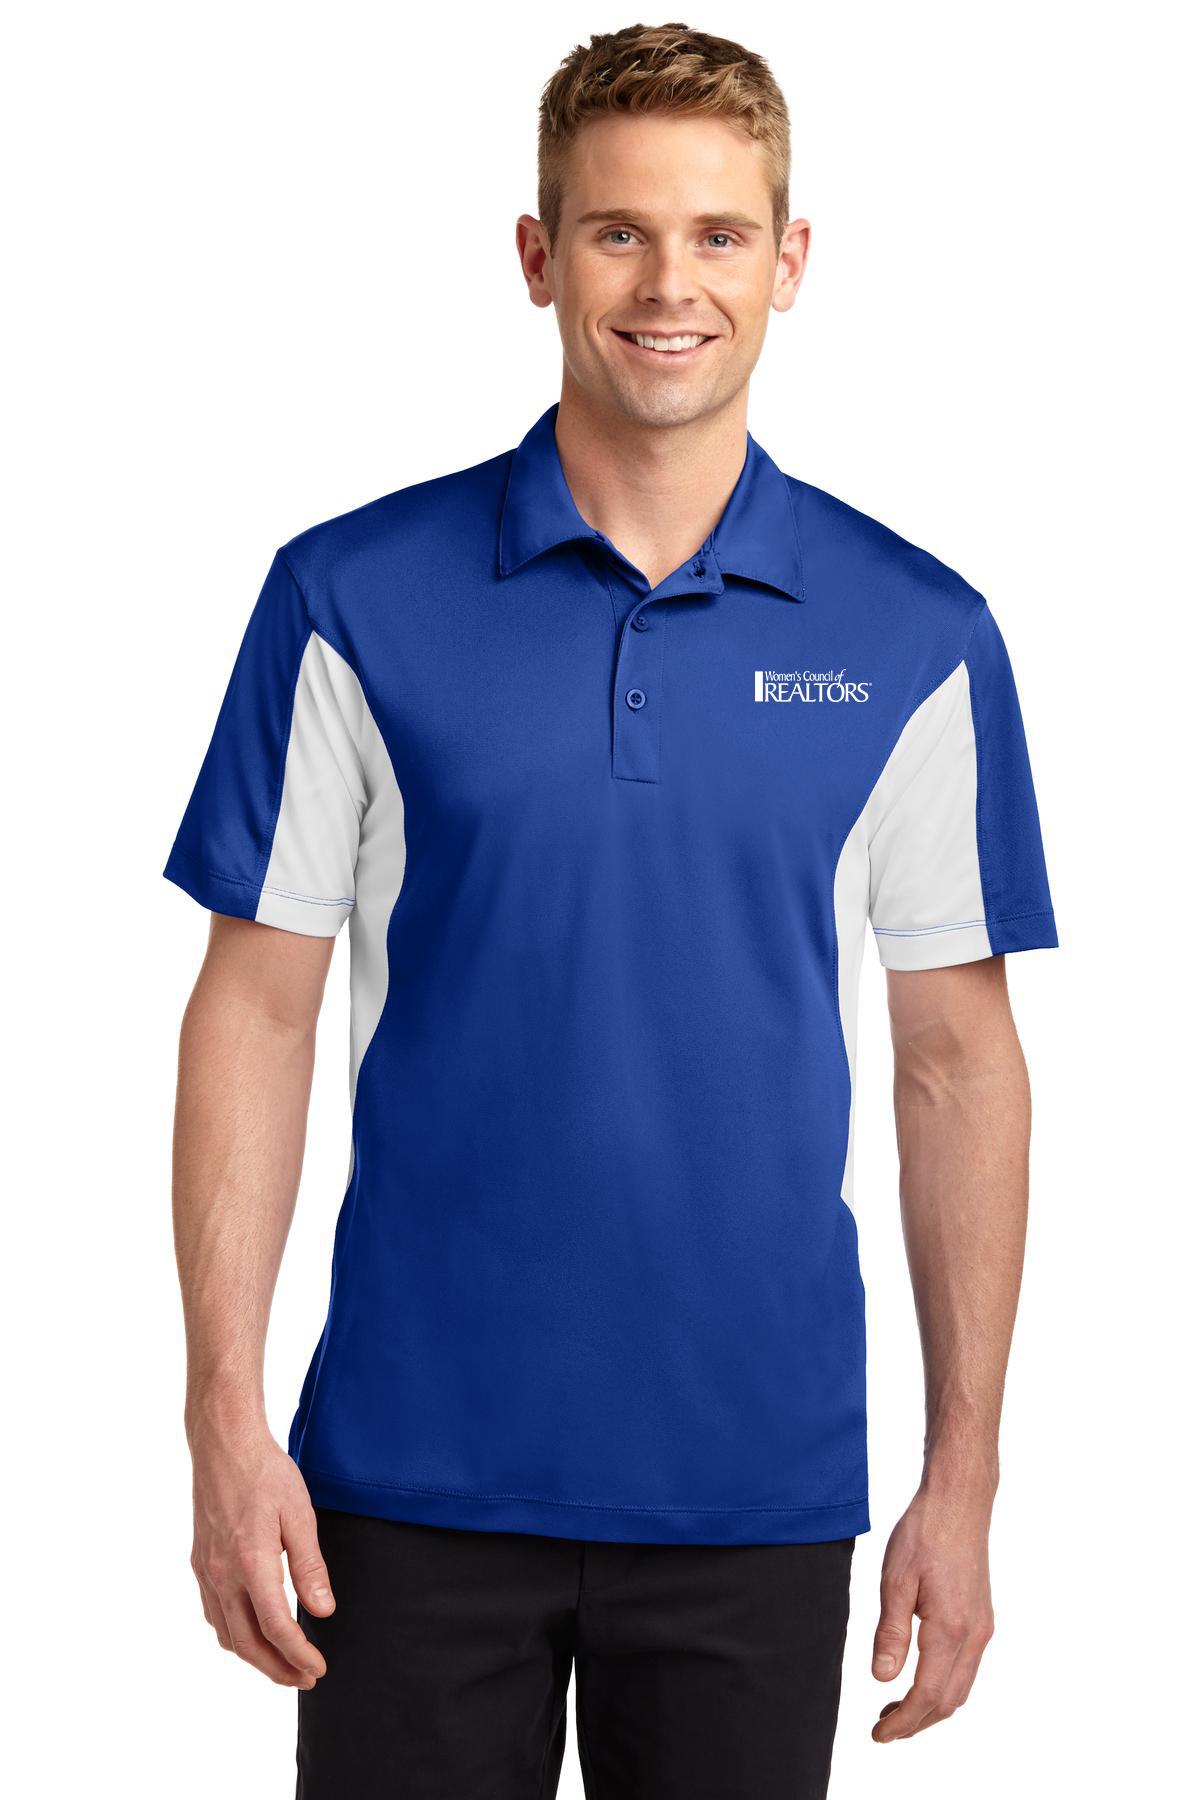 Mens Side Blocked Sport-Wick Sport Shirt Golfs, Shirts, Collared, Polos, Plackets